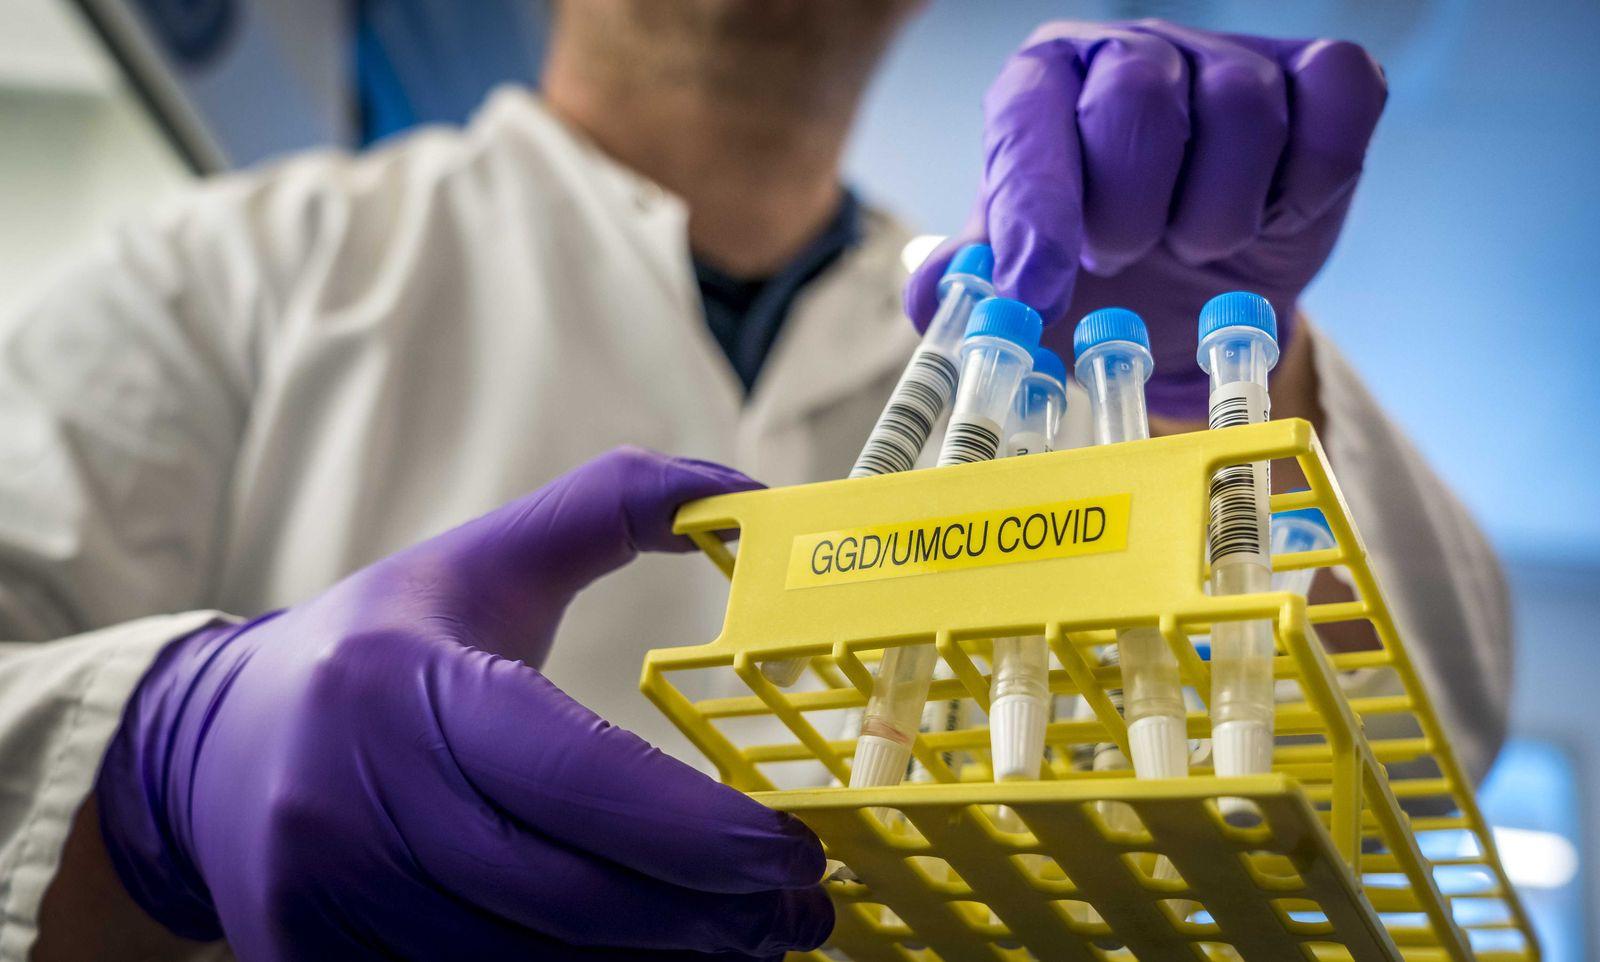 UMC Utrecht tests reliability of coronavirus rapid tests, Netherlands - 25 Sep 2020